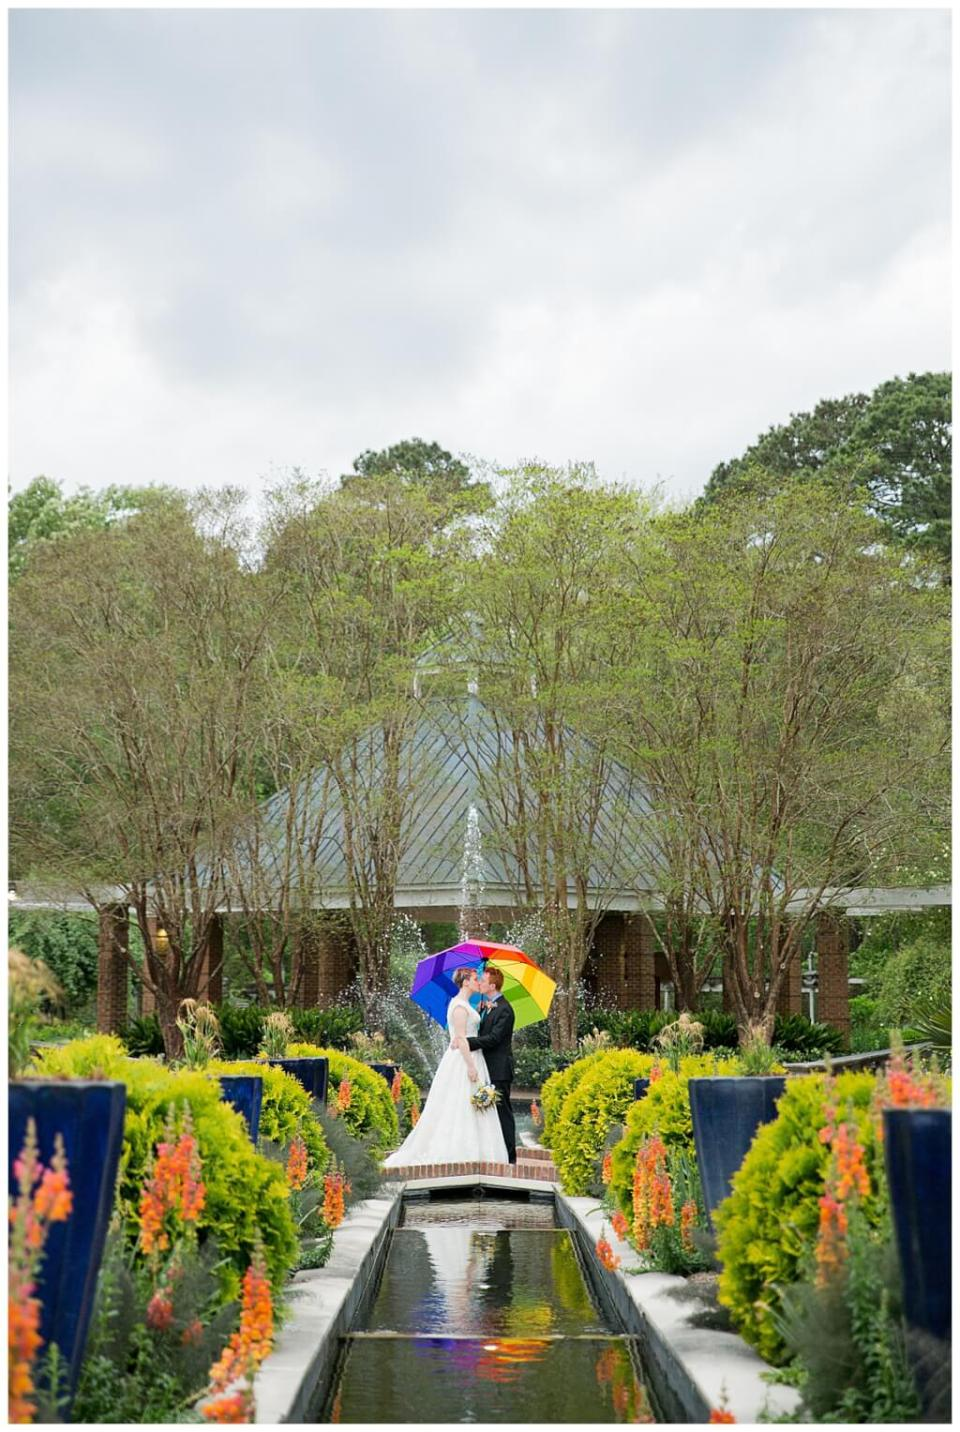 Columbia, SC LGBTQ Friendly Couple with Rainbow Umbrella at Riverbanks Zoo Botanical Gardens